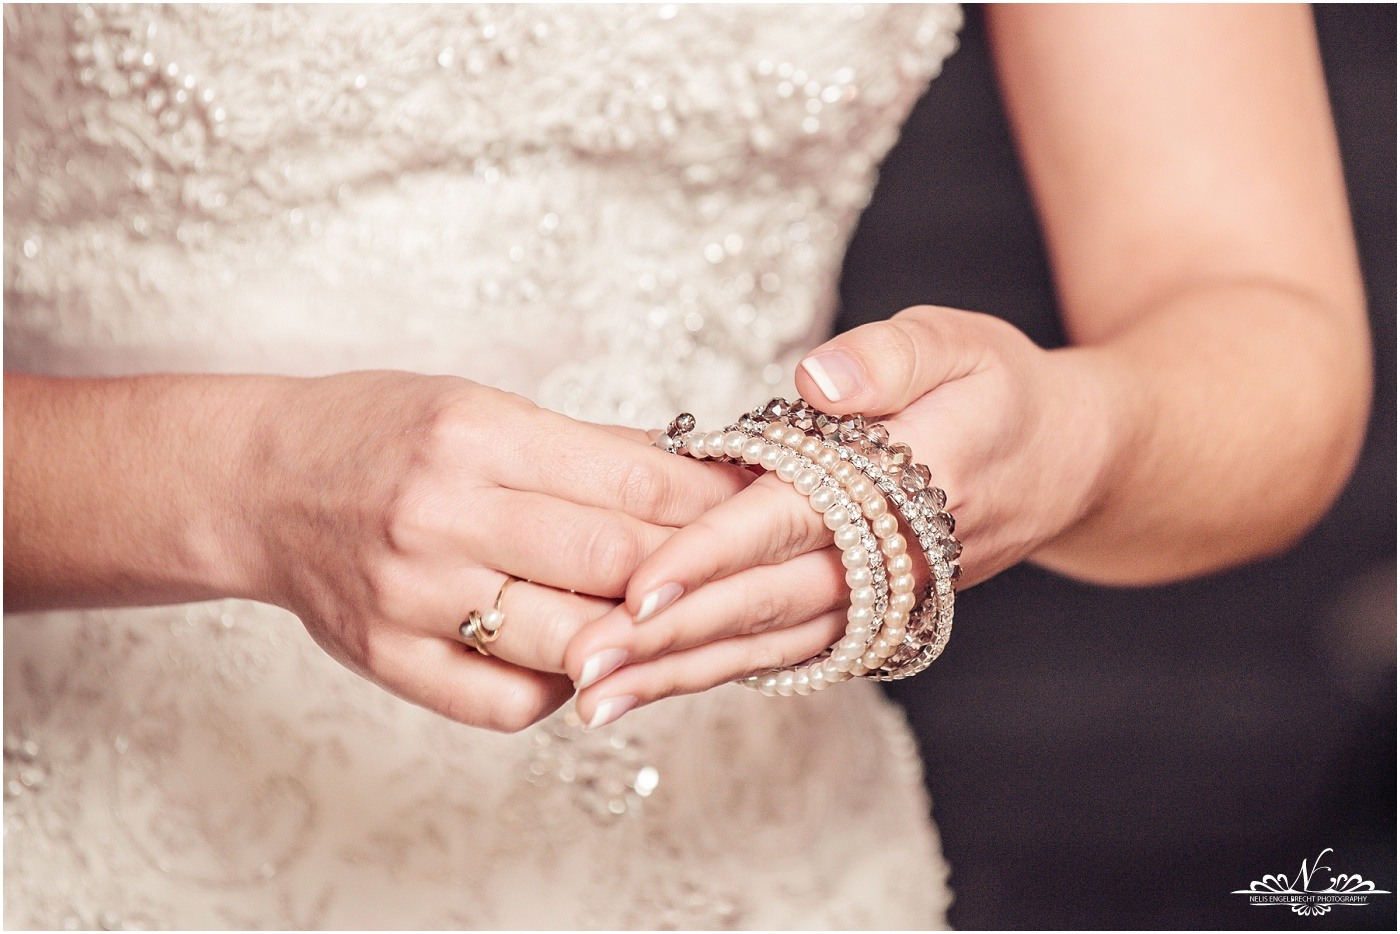 Eensgezind-Wedding-Photos-Nelis-Engelbrecht-Photography-035